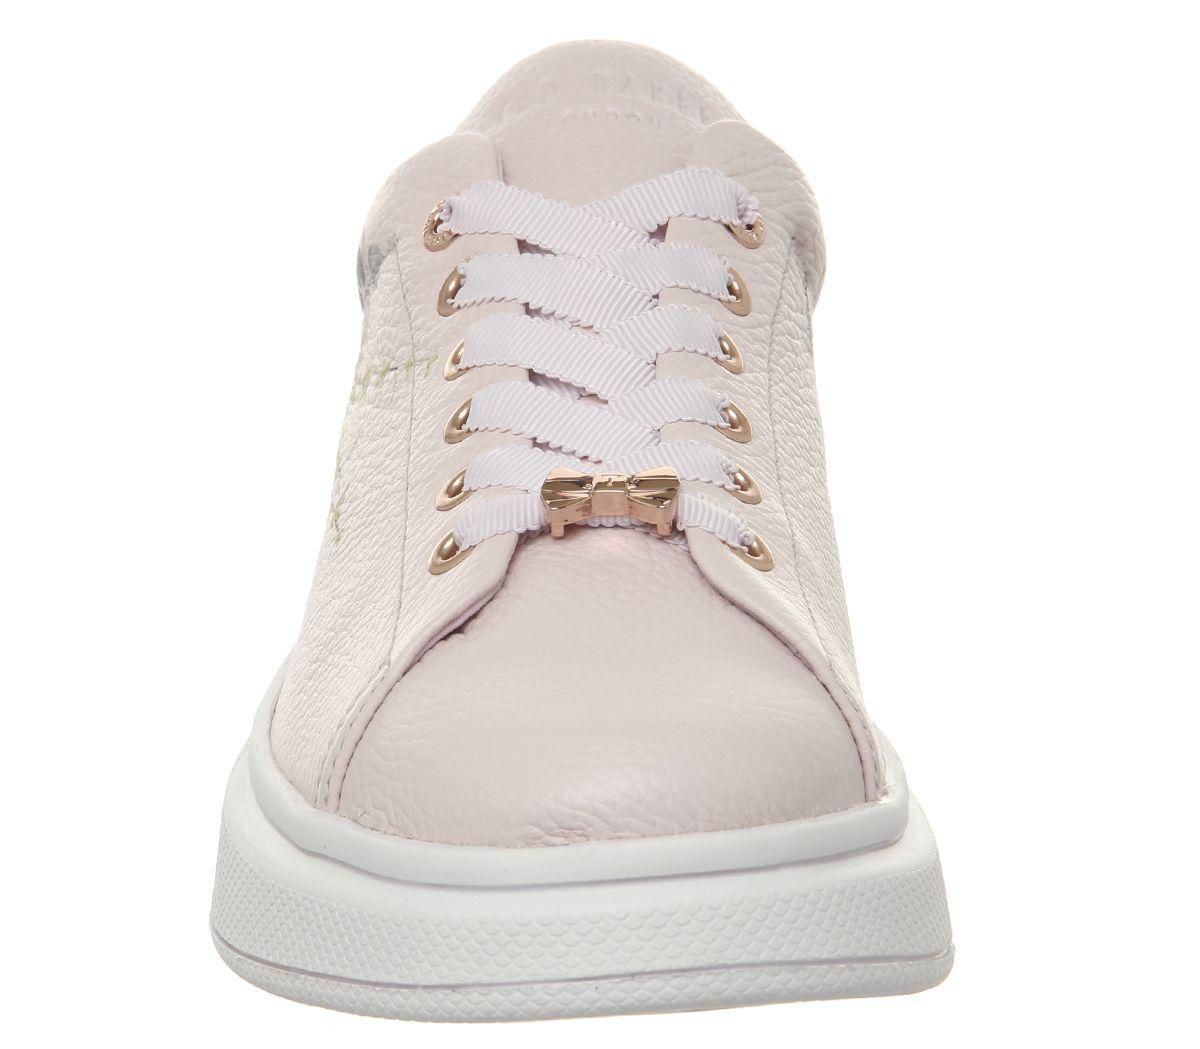 Womens Ted Baker Baker Baker Ailbe 3 Trainers Elegant Pink Flats c1f896